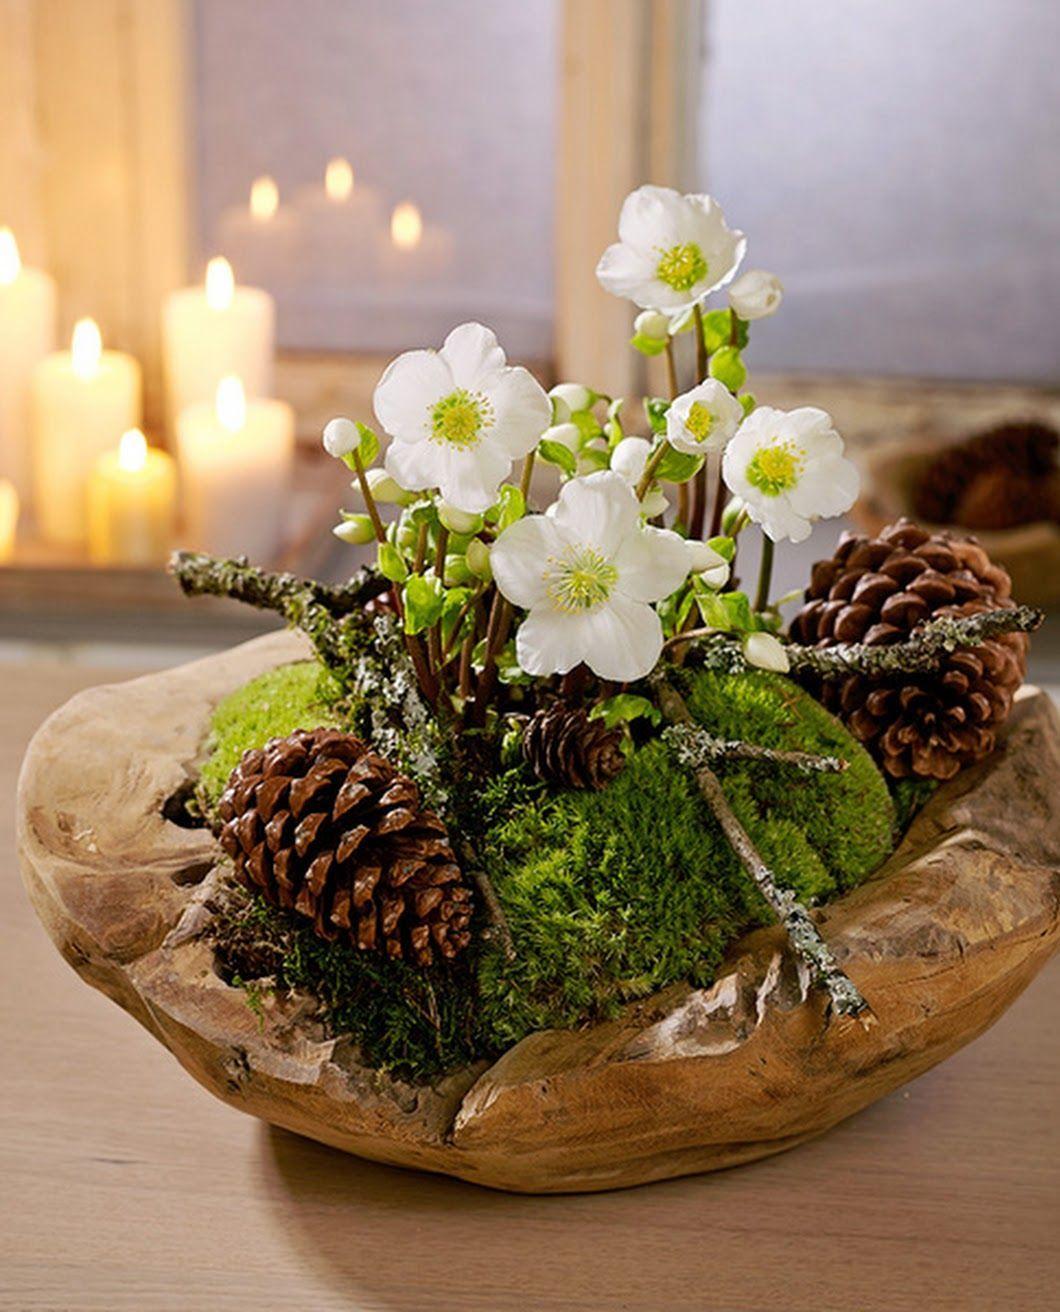 Foto #kerstbloemstukken Foto #kerstbloemstukken